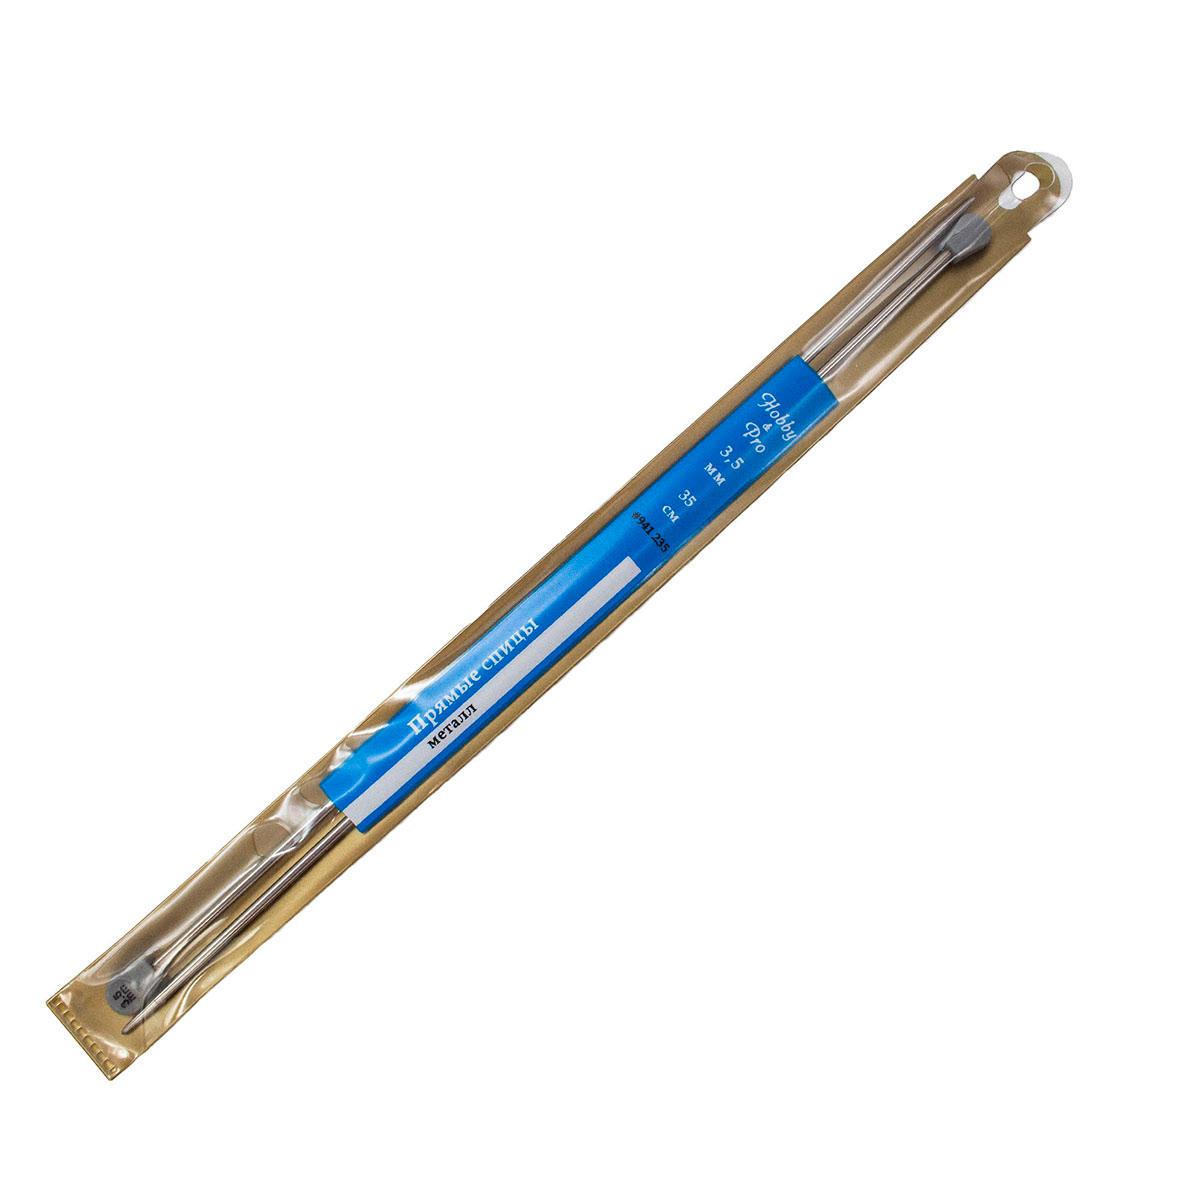 941235 Спицы прямые металл 35см, 3,5мм Hobby&Pro